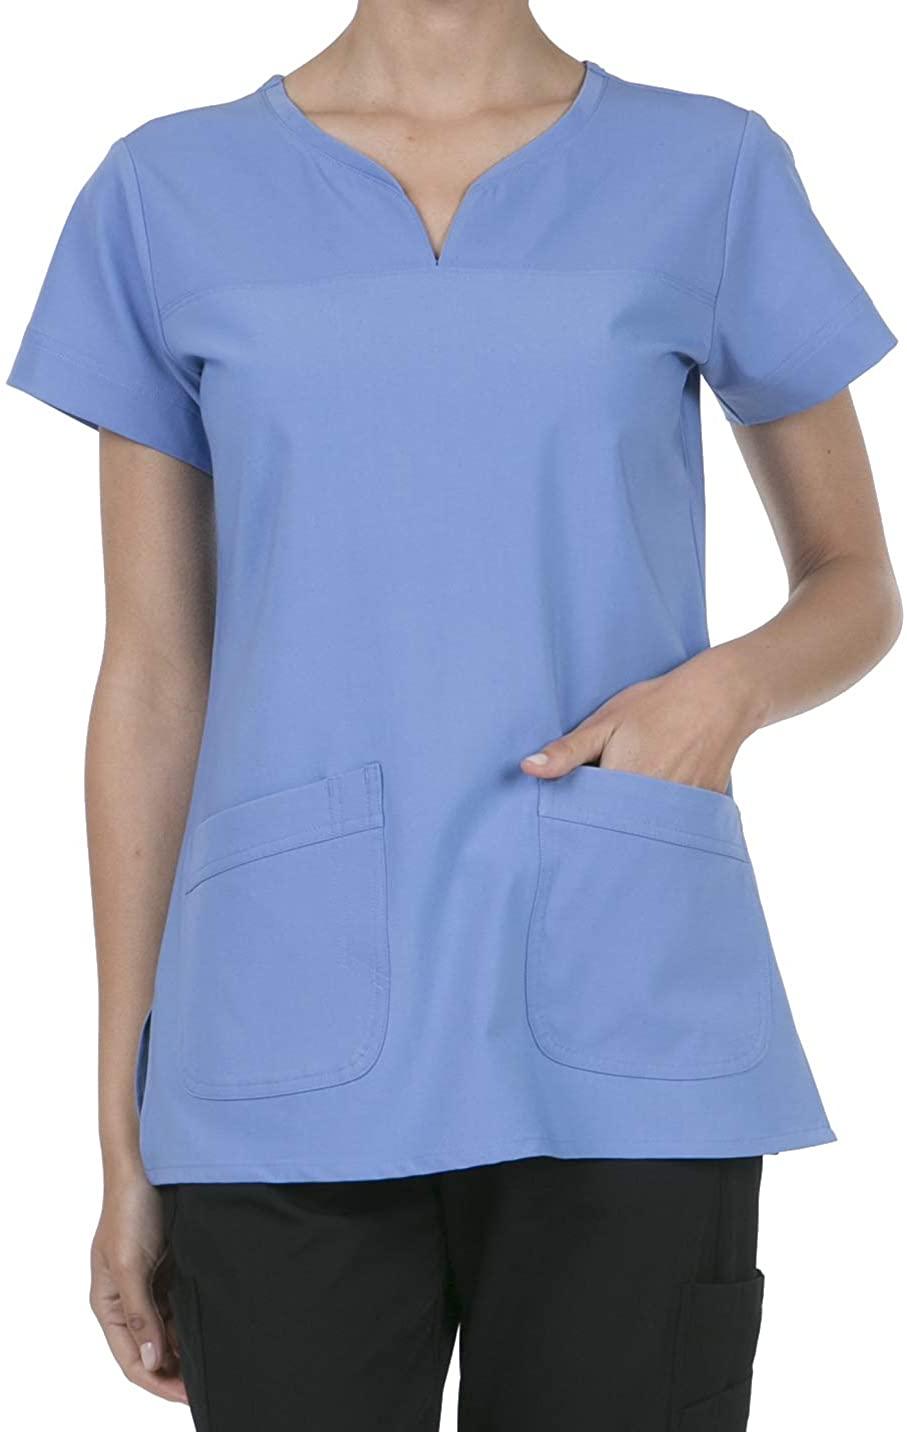 8045 Women's Uniform Scrubs Medical 2 Pocket Scrub Top LT.Denim S